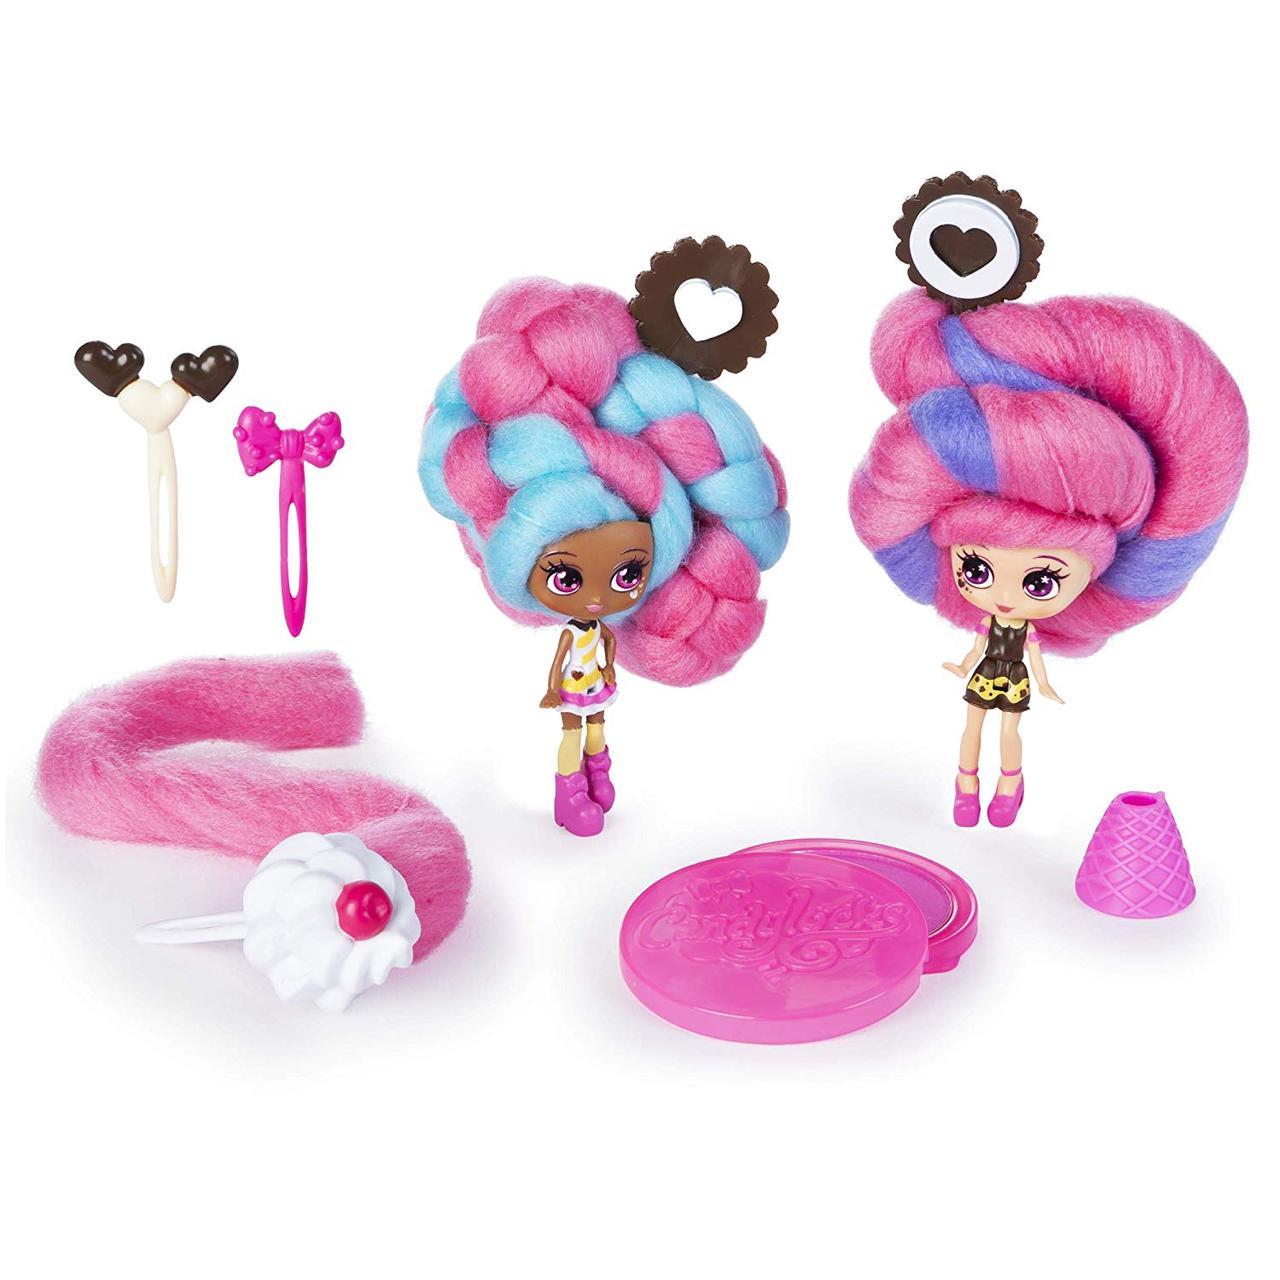 Candylocks Набор ароматизированных кукол-сюрприз Кендилокс сахарная вата Candylocks (США) Spin Master Оригинал